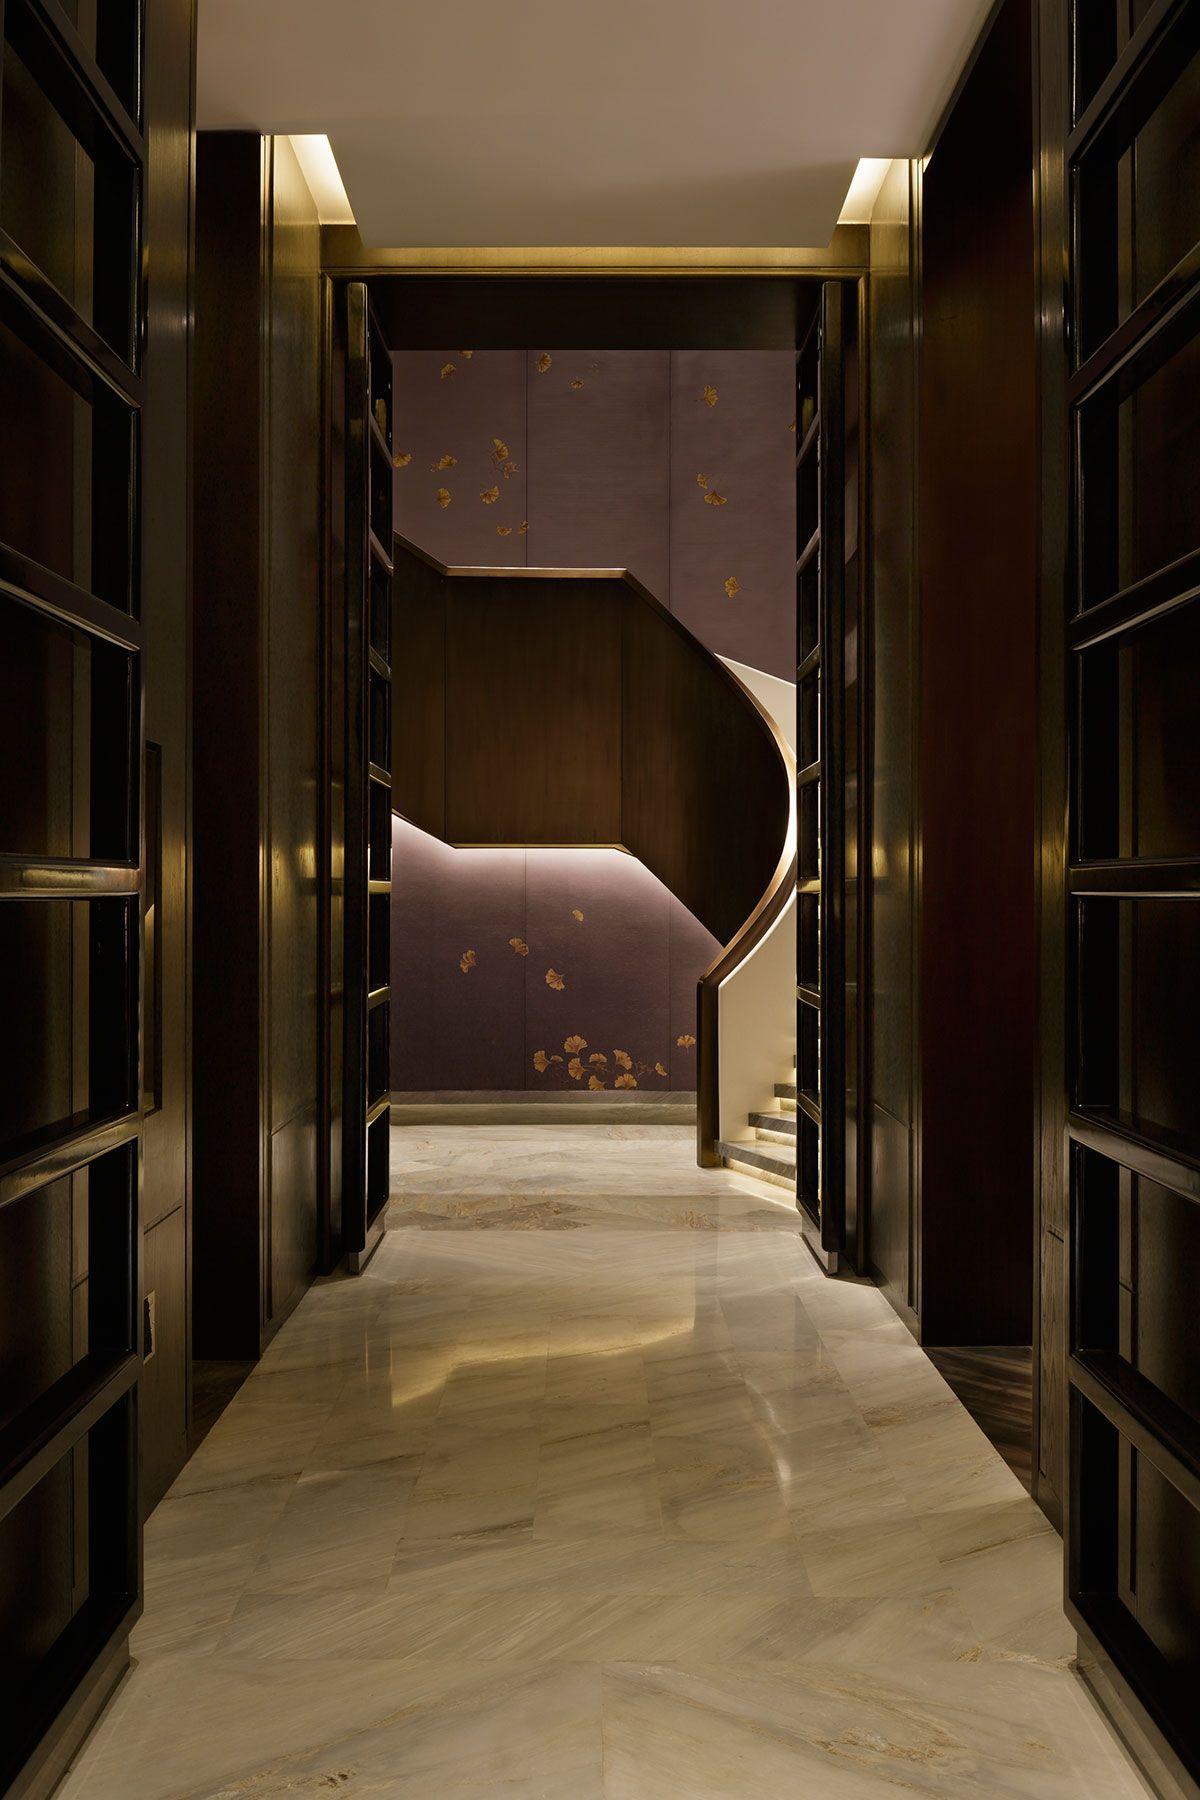 Yabu pushelberg waldorf astoria beijing yabu pushelberg for Design hotel waldorf